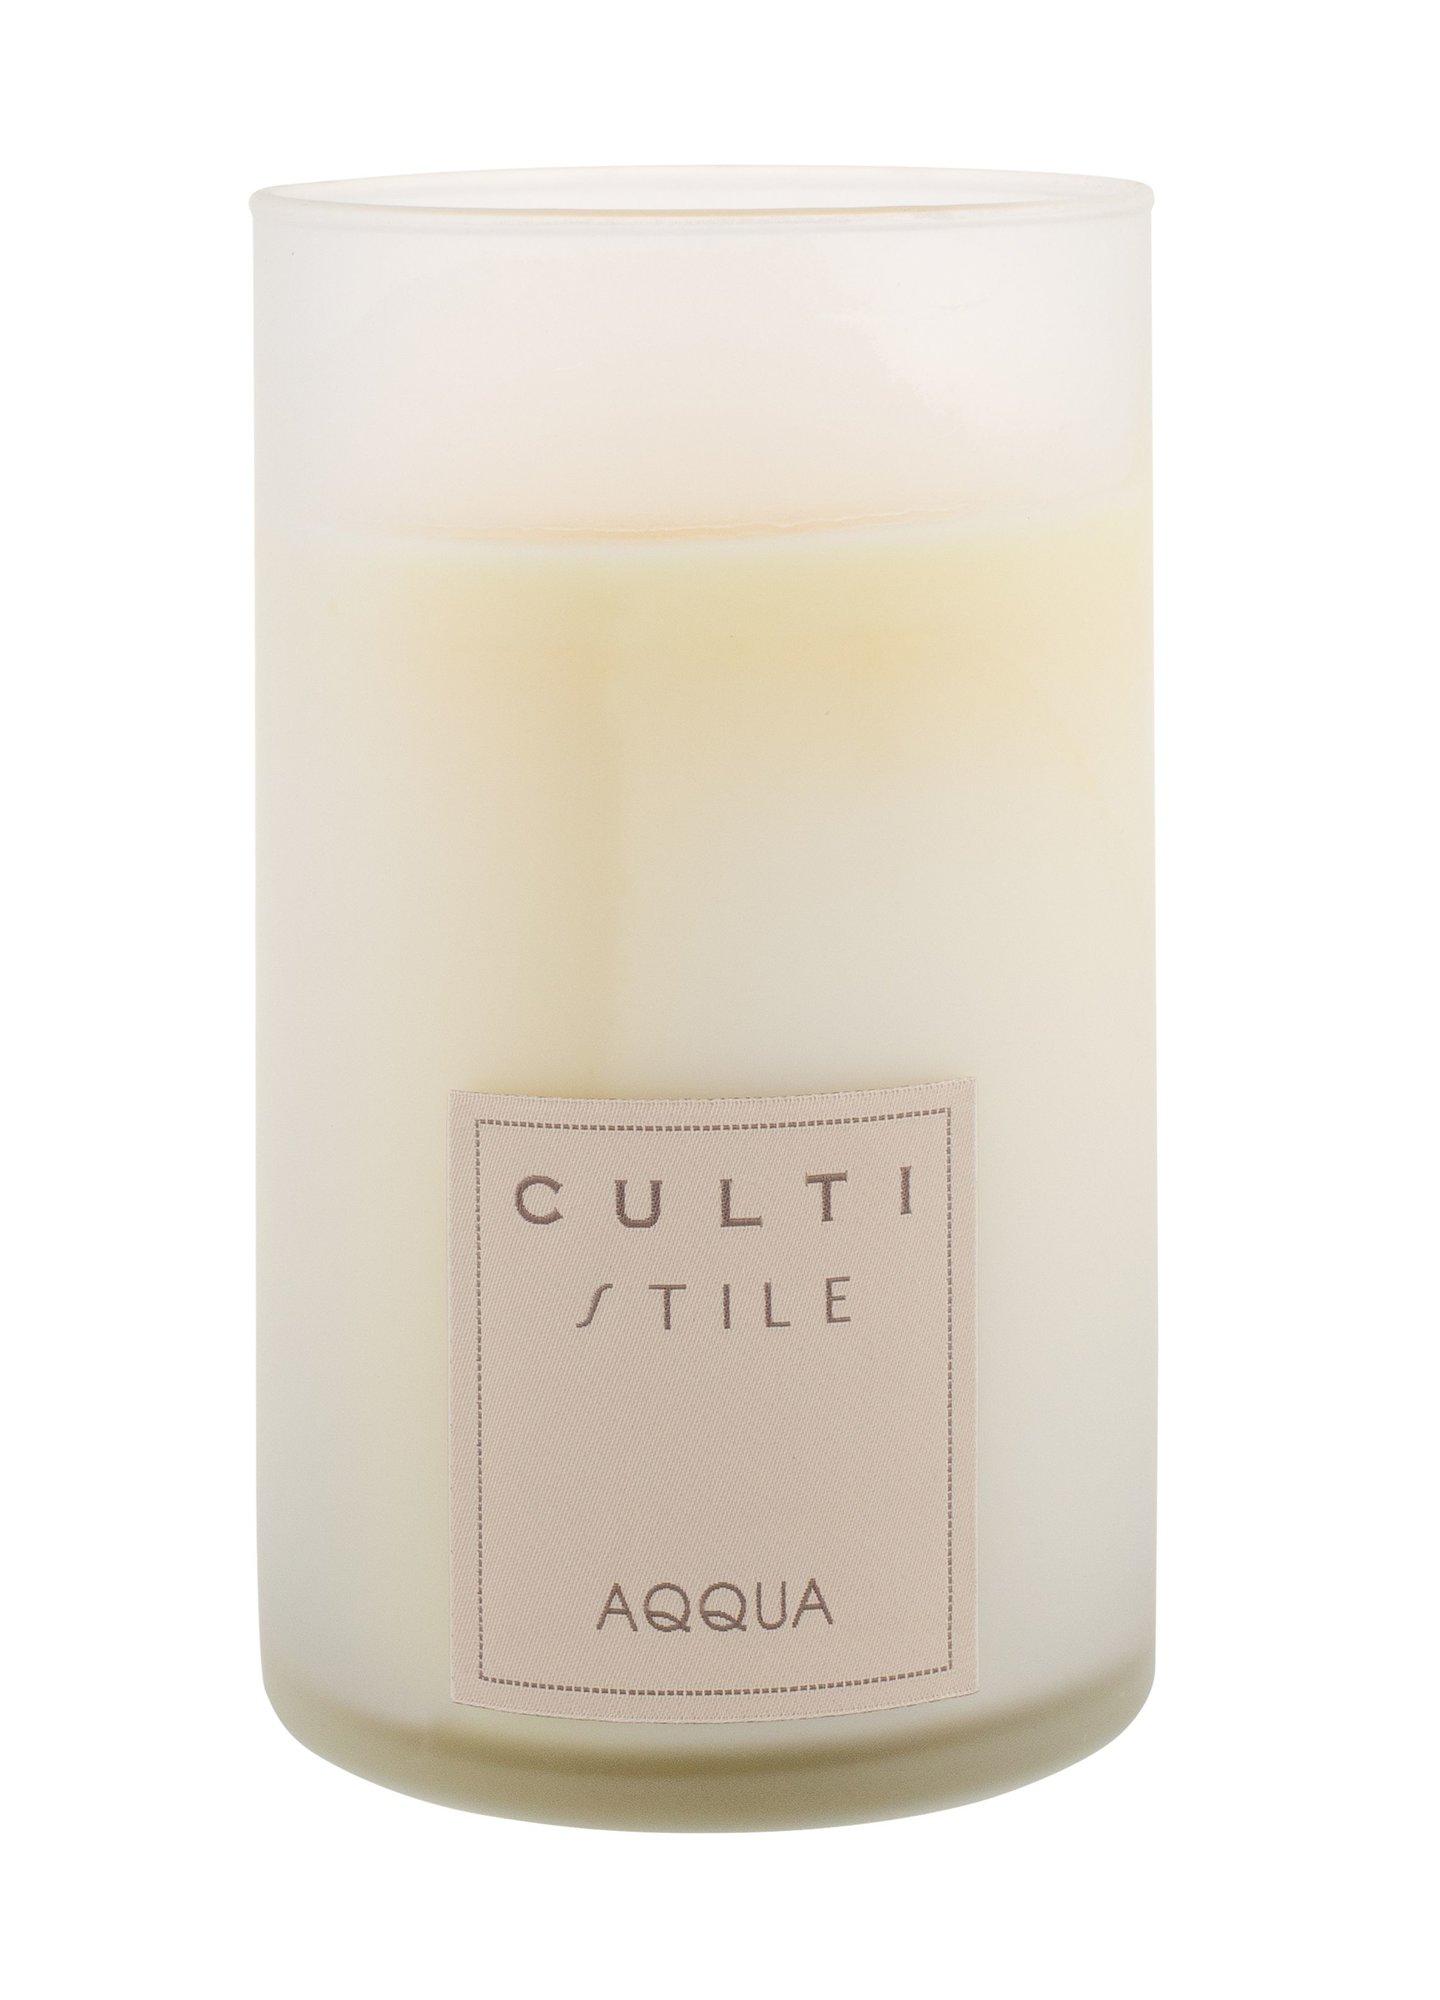 Culti Stile Aqqua Scented Candle 1200ml